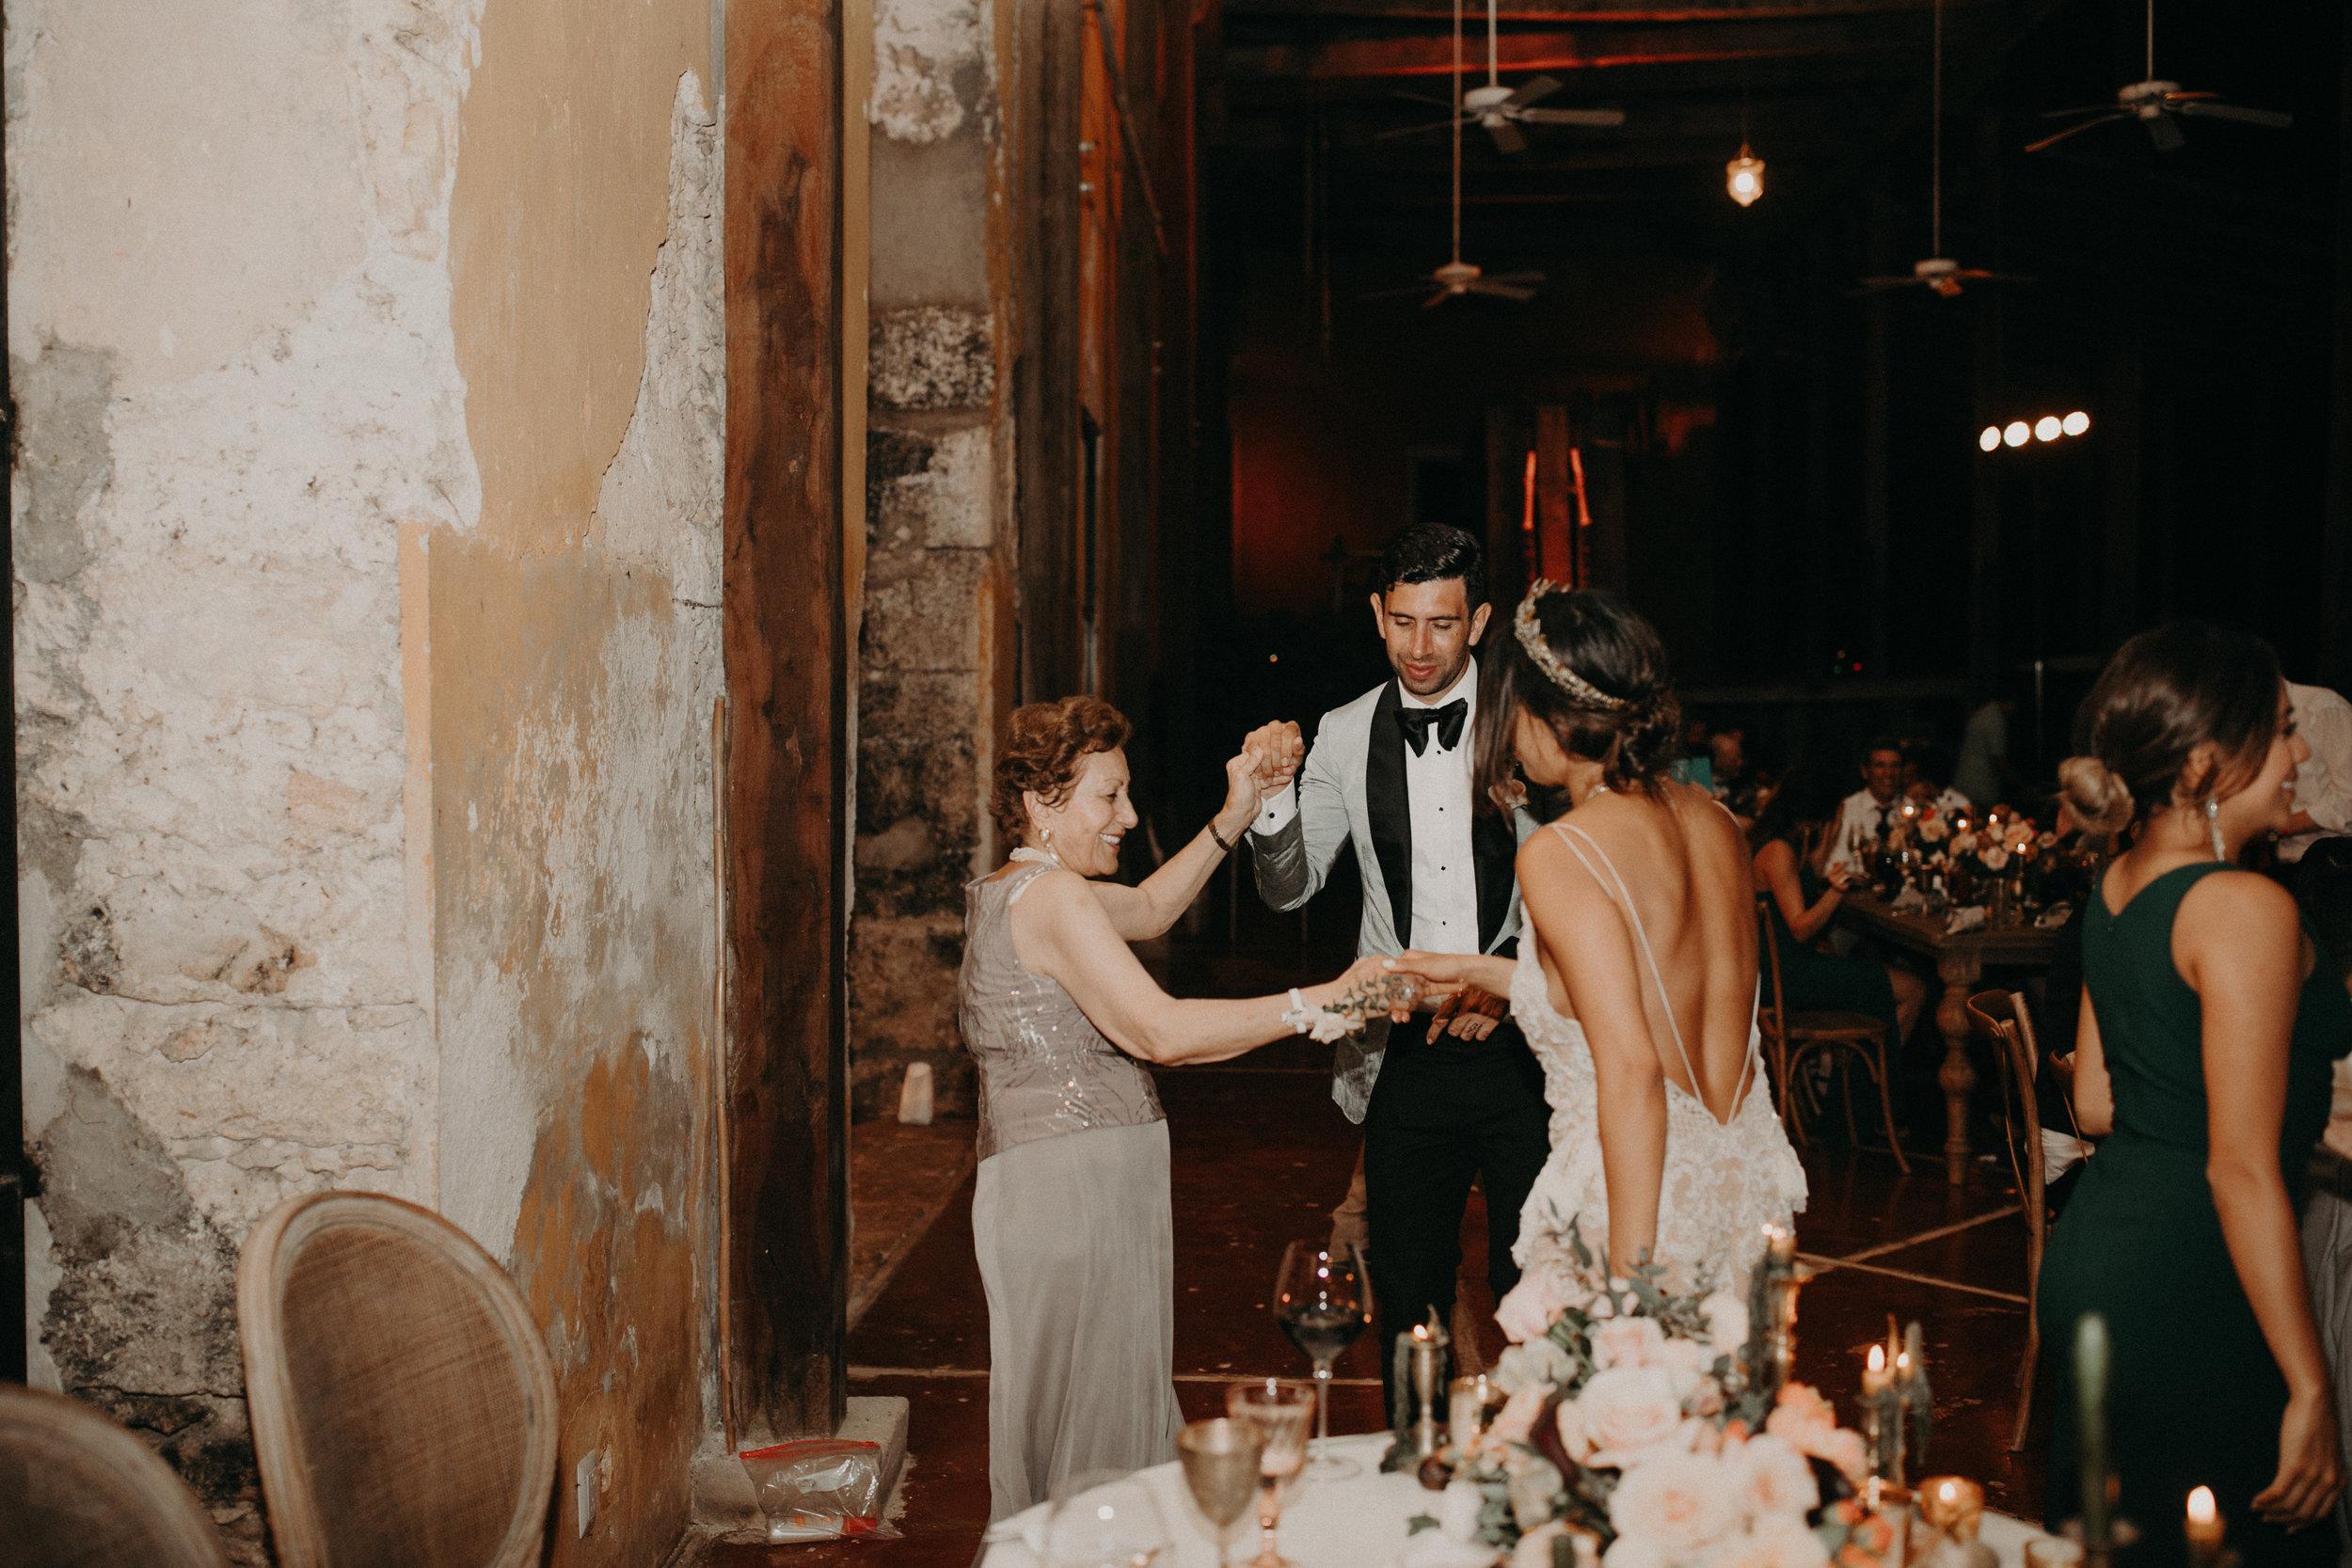 Hacienda Temozon Yucatan Mexico Wedding | Ida & Peter Emily Magers Photography-1366.jpg